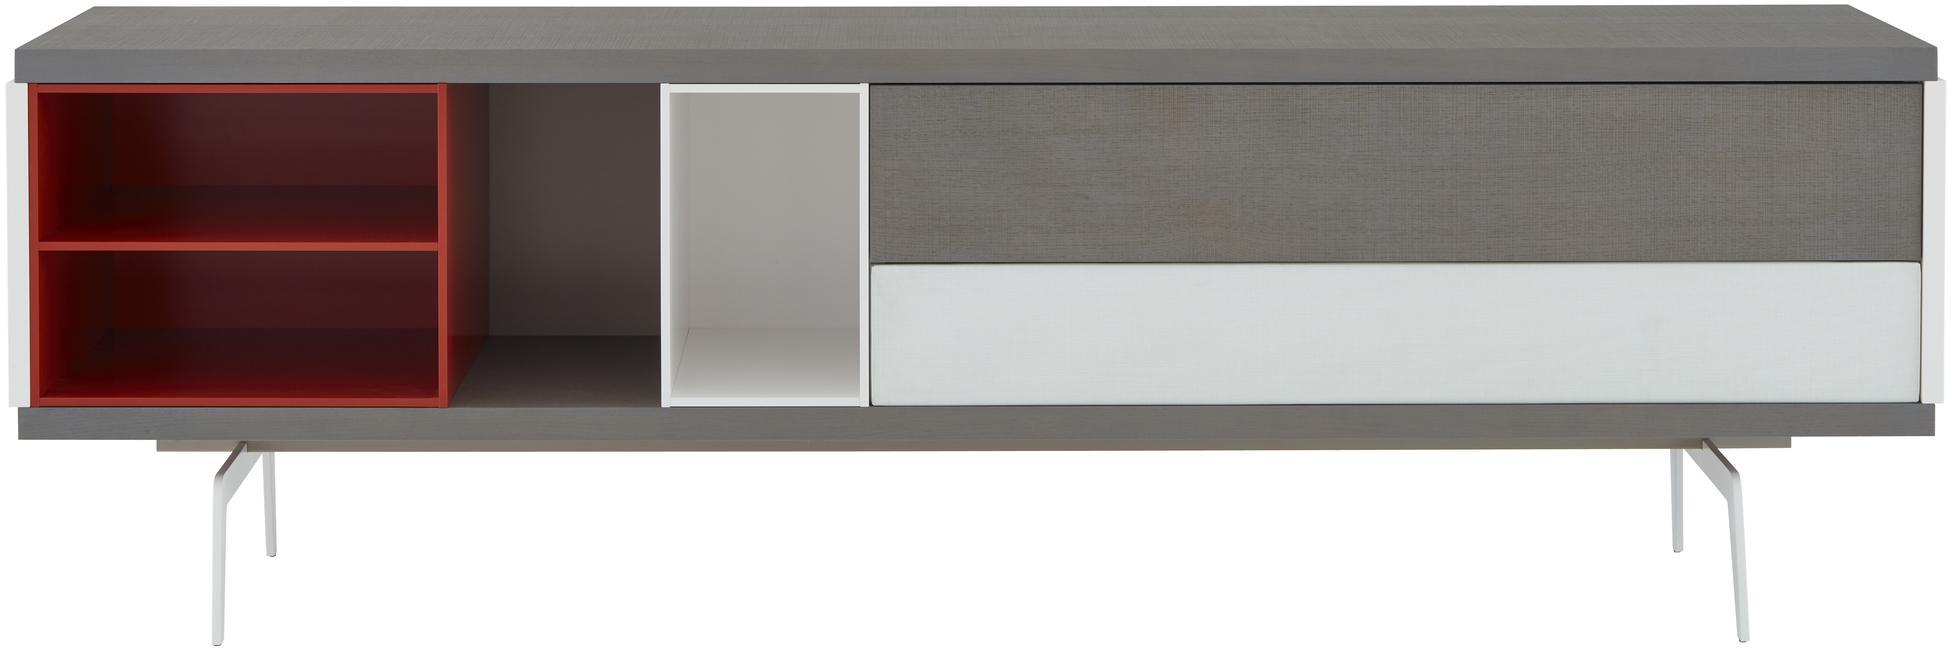 Mixte Living Room Sideboards Designer Mauro Lipparini Ligne Roset # Ligne Roset Meuble Tv